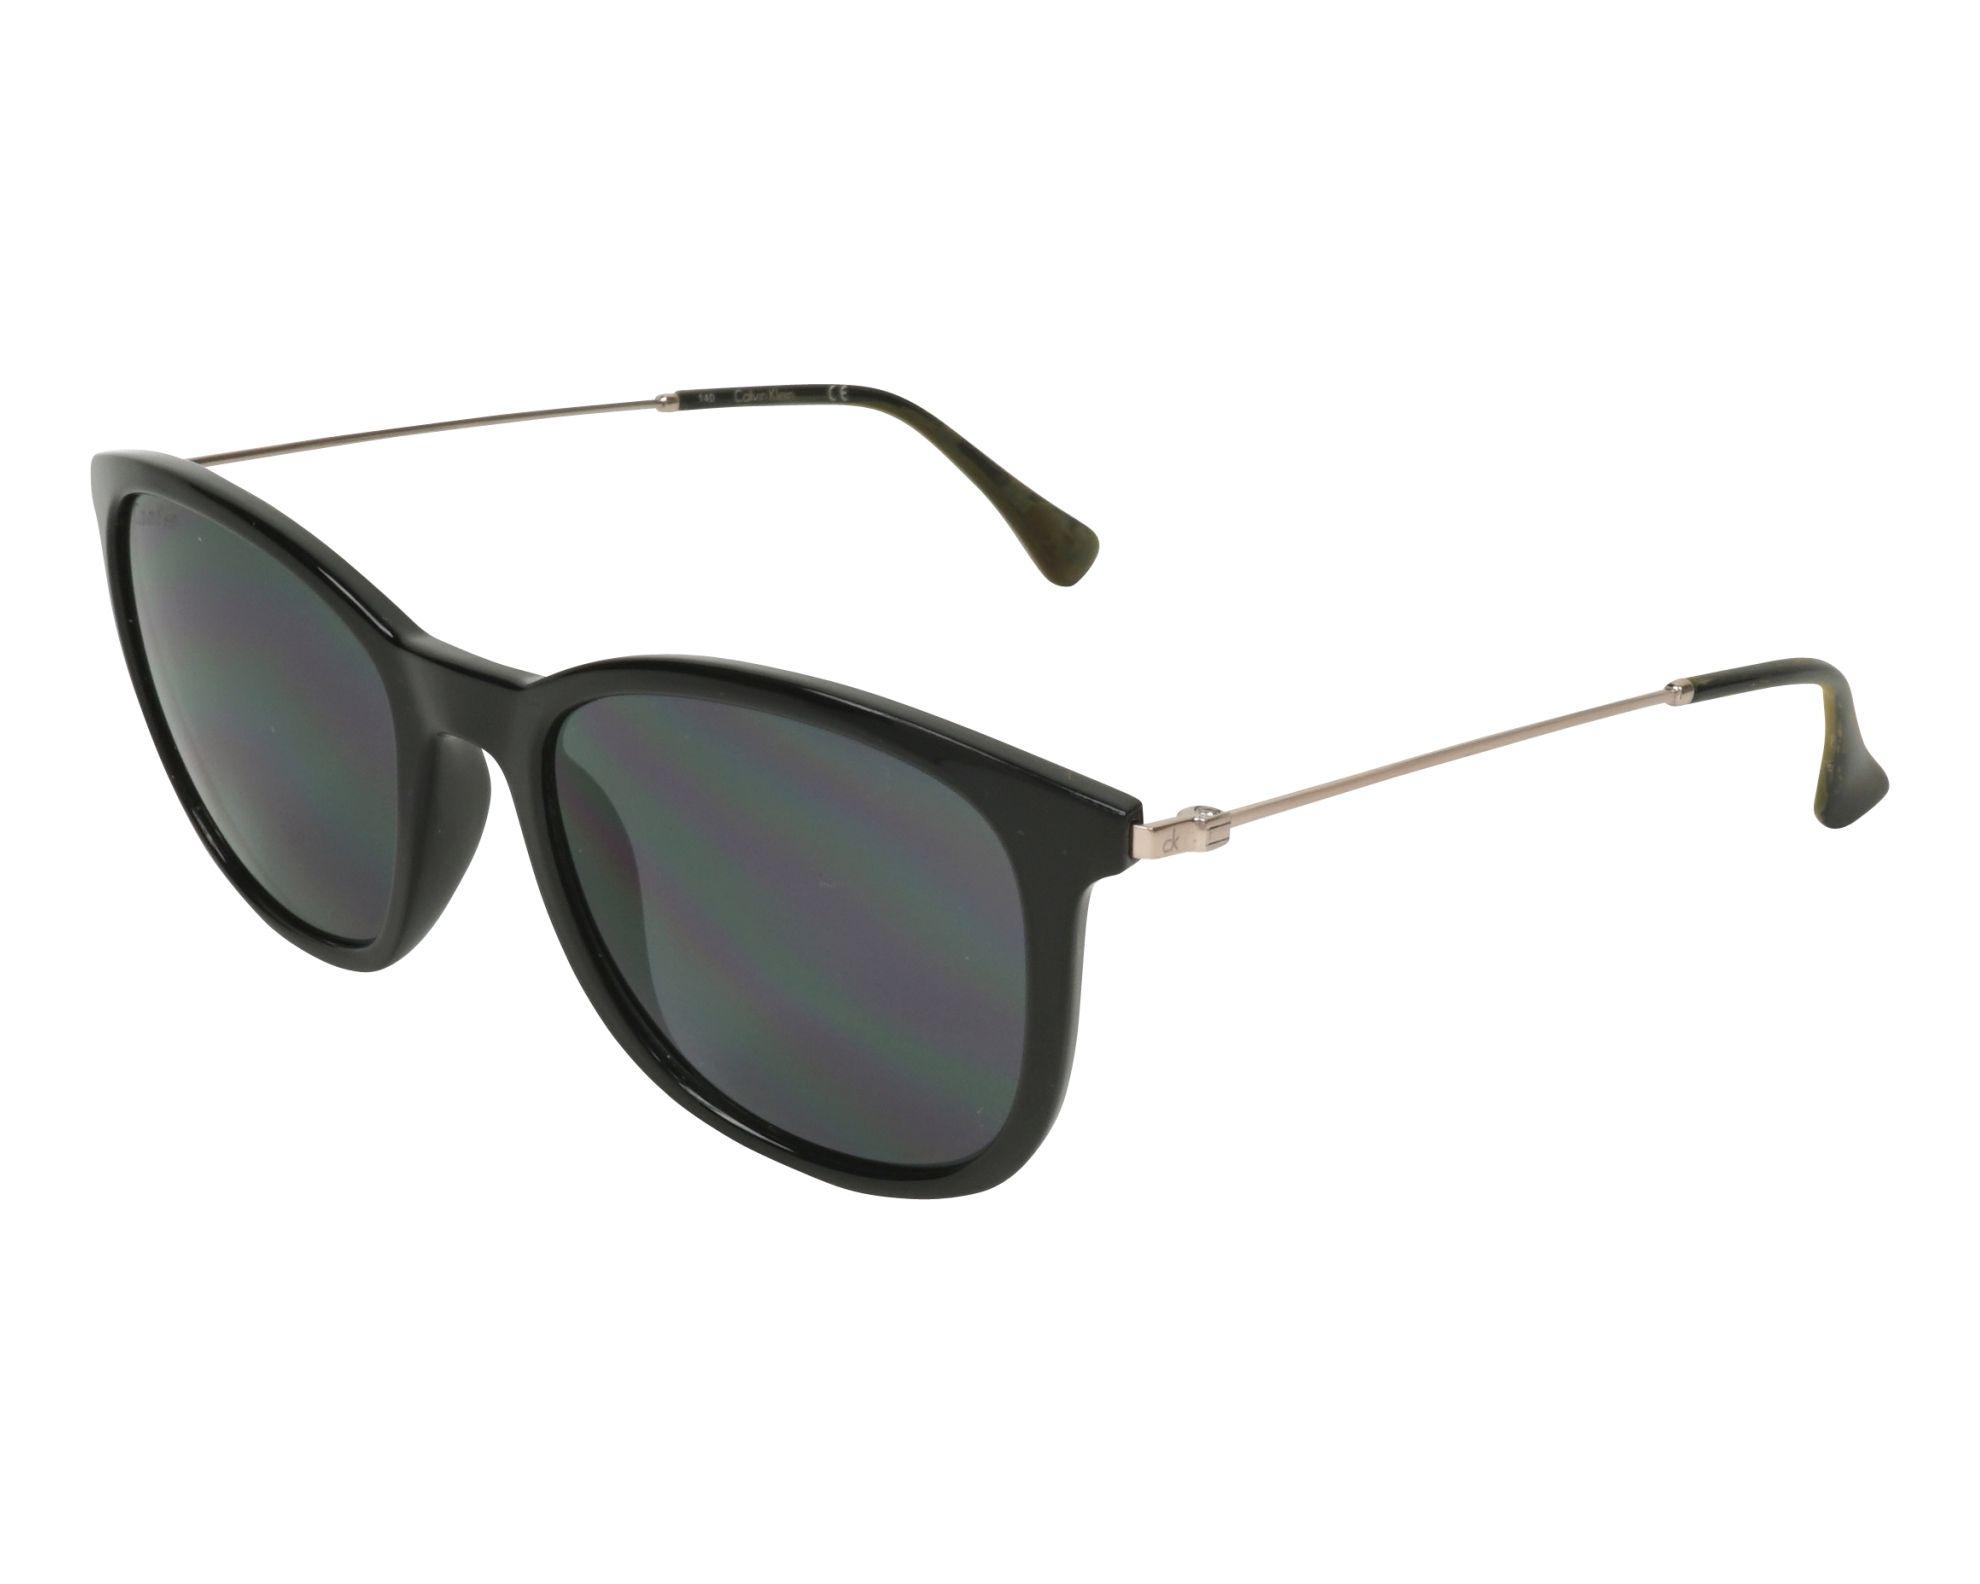 45d4b3637d Gafas de sol Calvin Klein CK-3173-S 001 53-19 Negra Oro